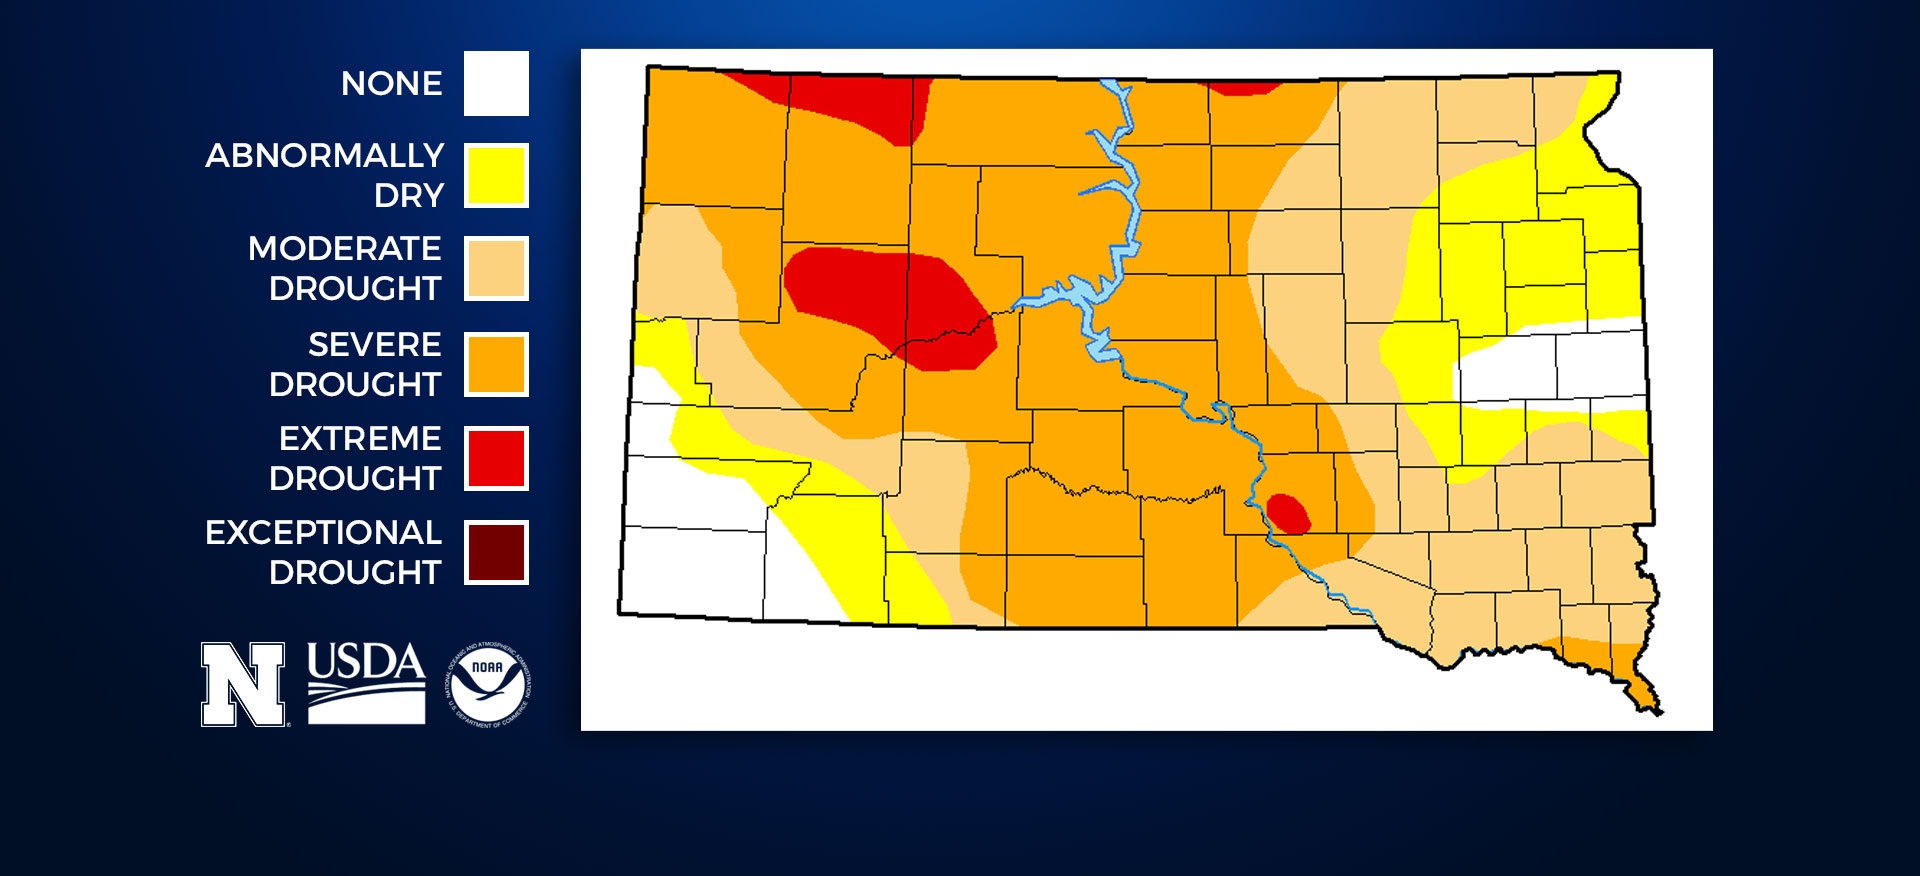 South Dakota Drought Monitor - August 10